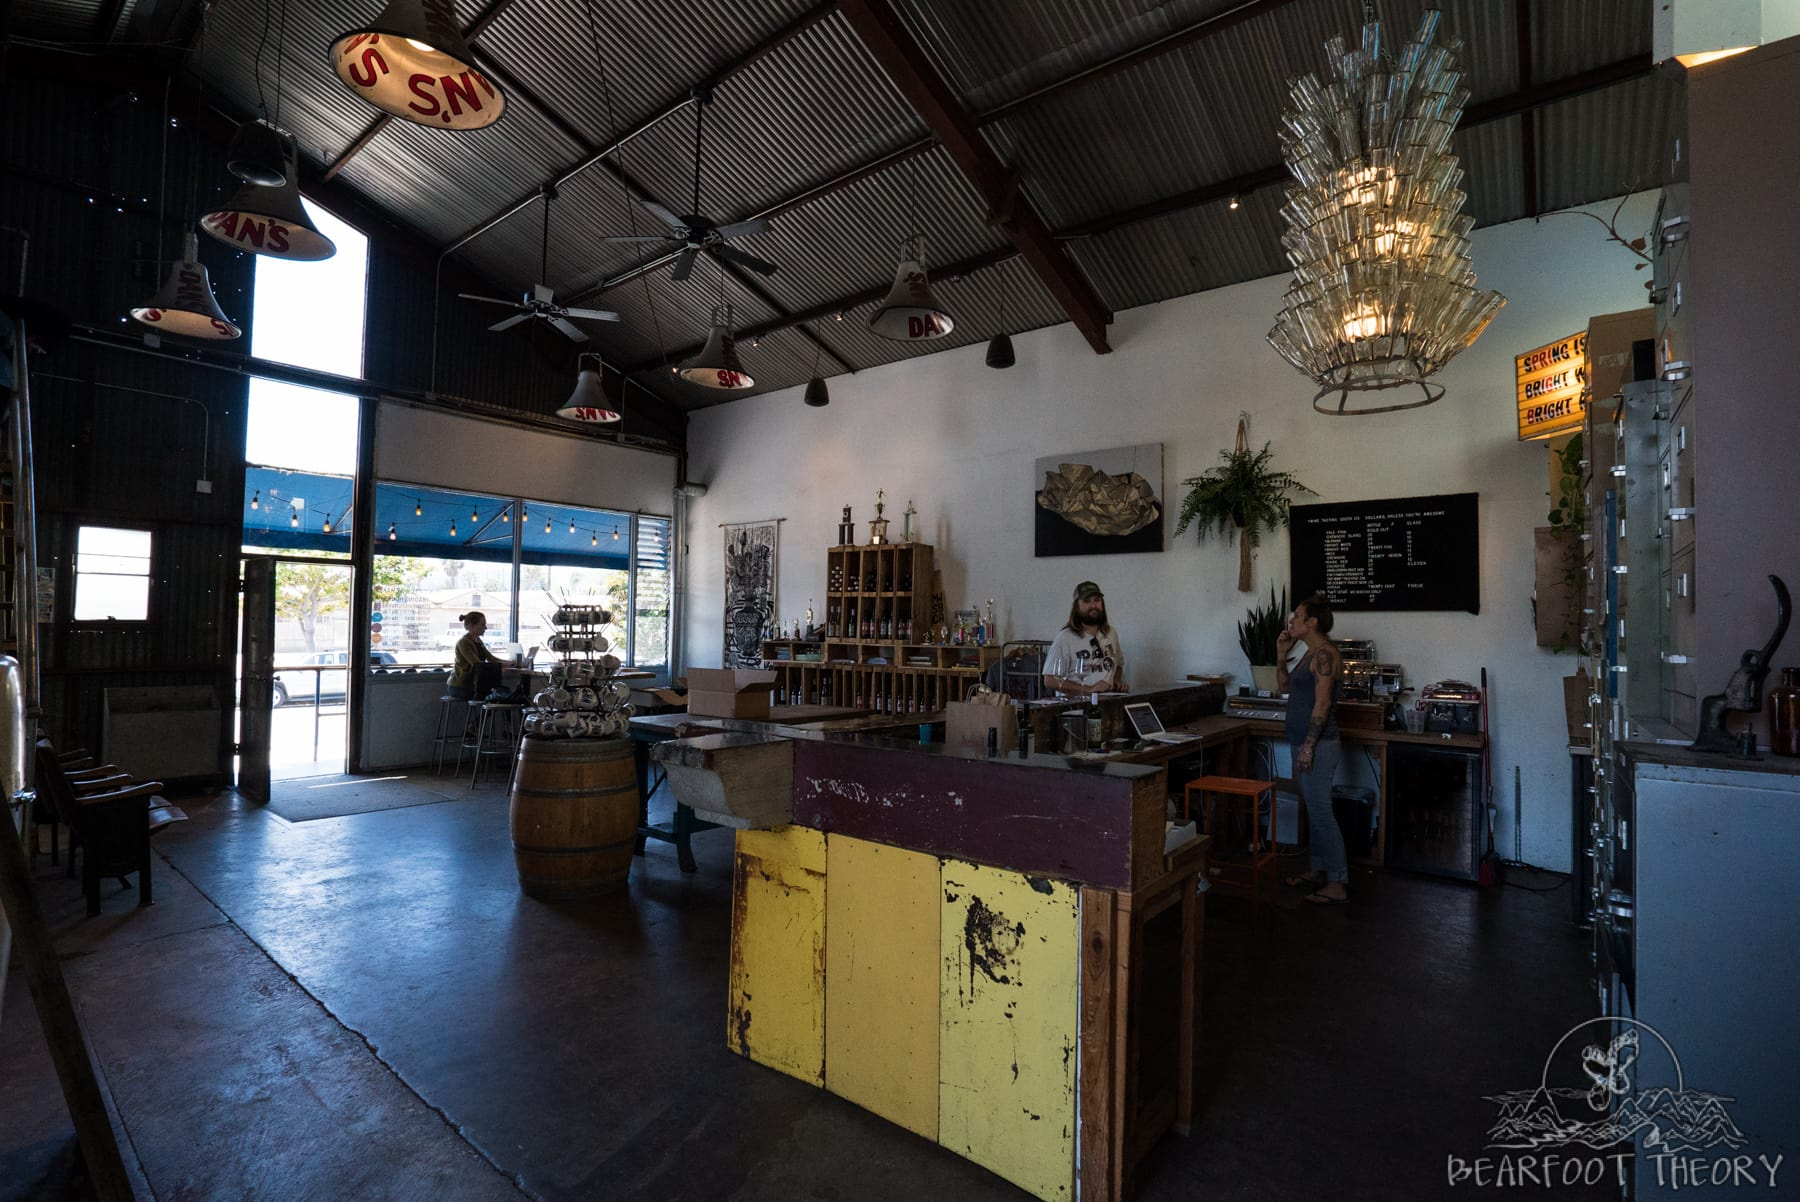 Municipal Winemakers - One of my favorite stops on Santa Barbara's wine trail